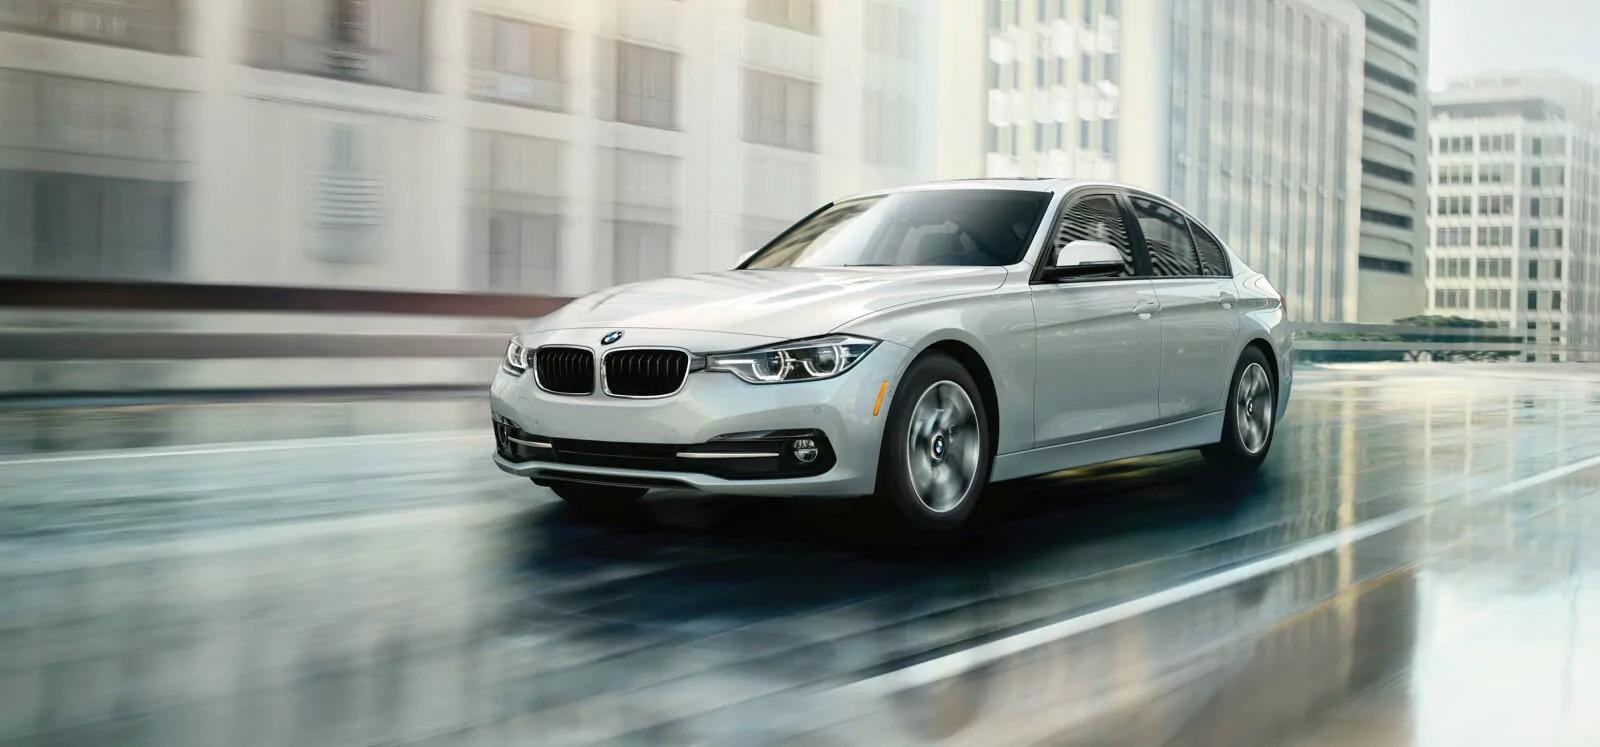 BMW_3Series_Sedan-FMA_1600x747.jpg